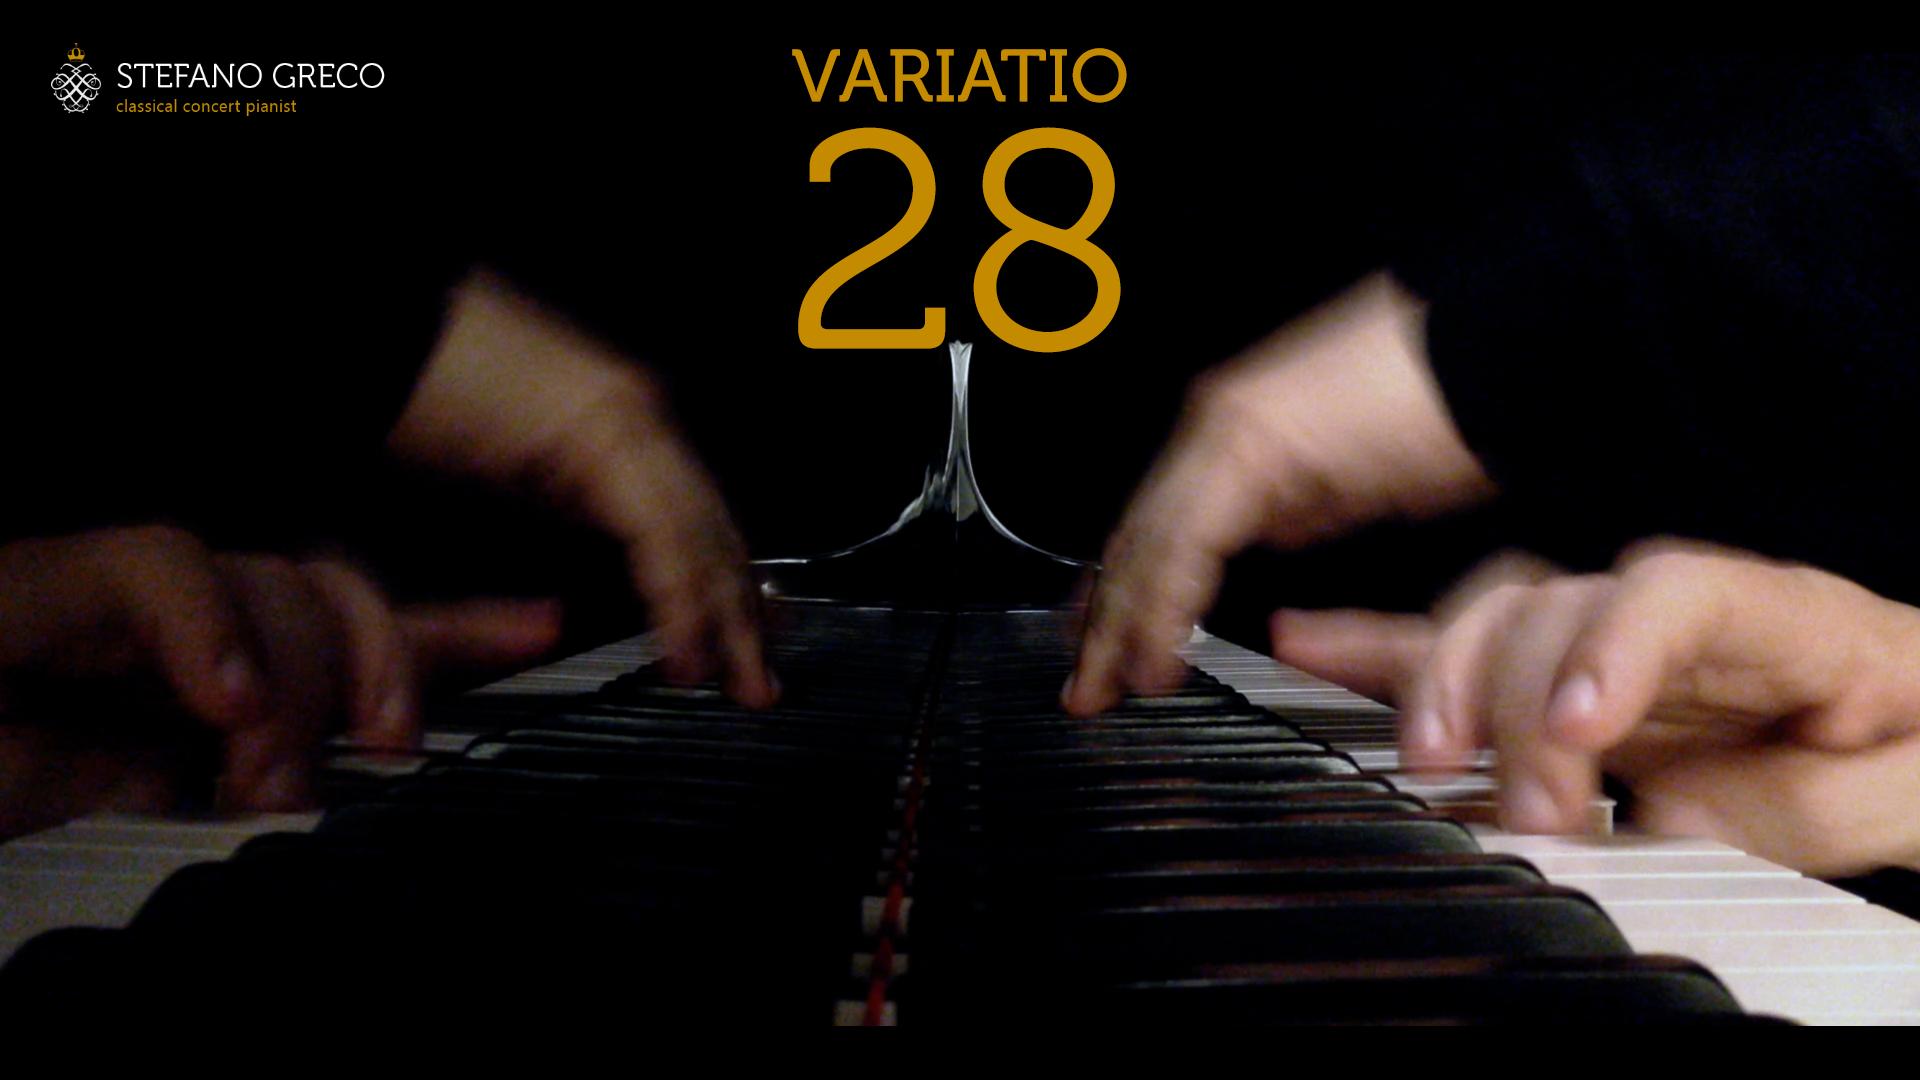 Bach. Goldberg Variations. Variatio XXVIII. Stefano Greco, piano